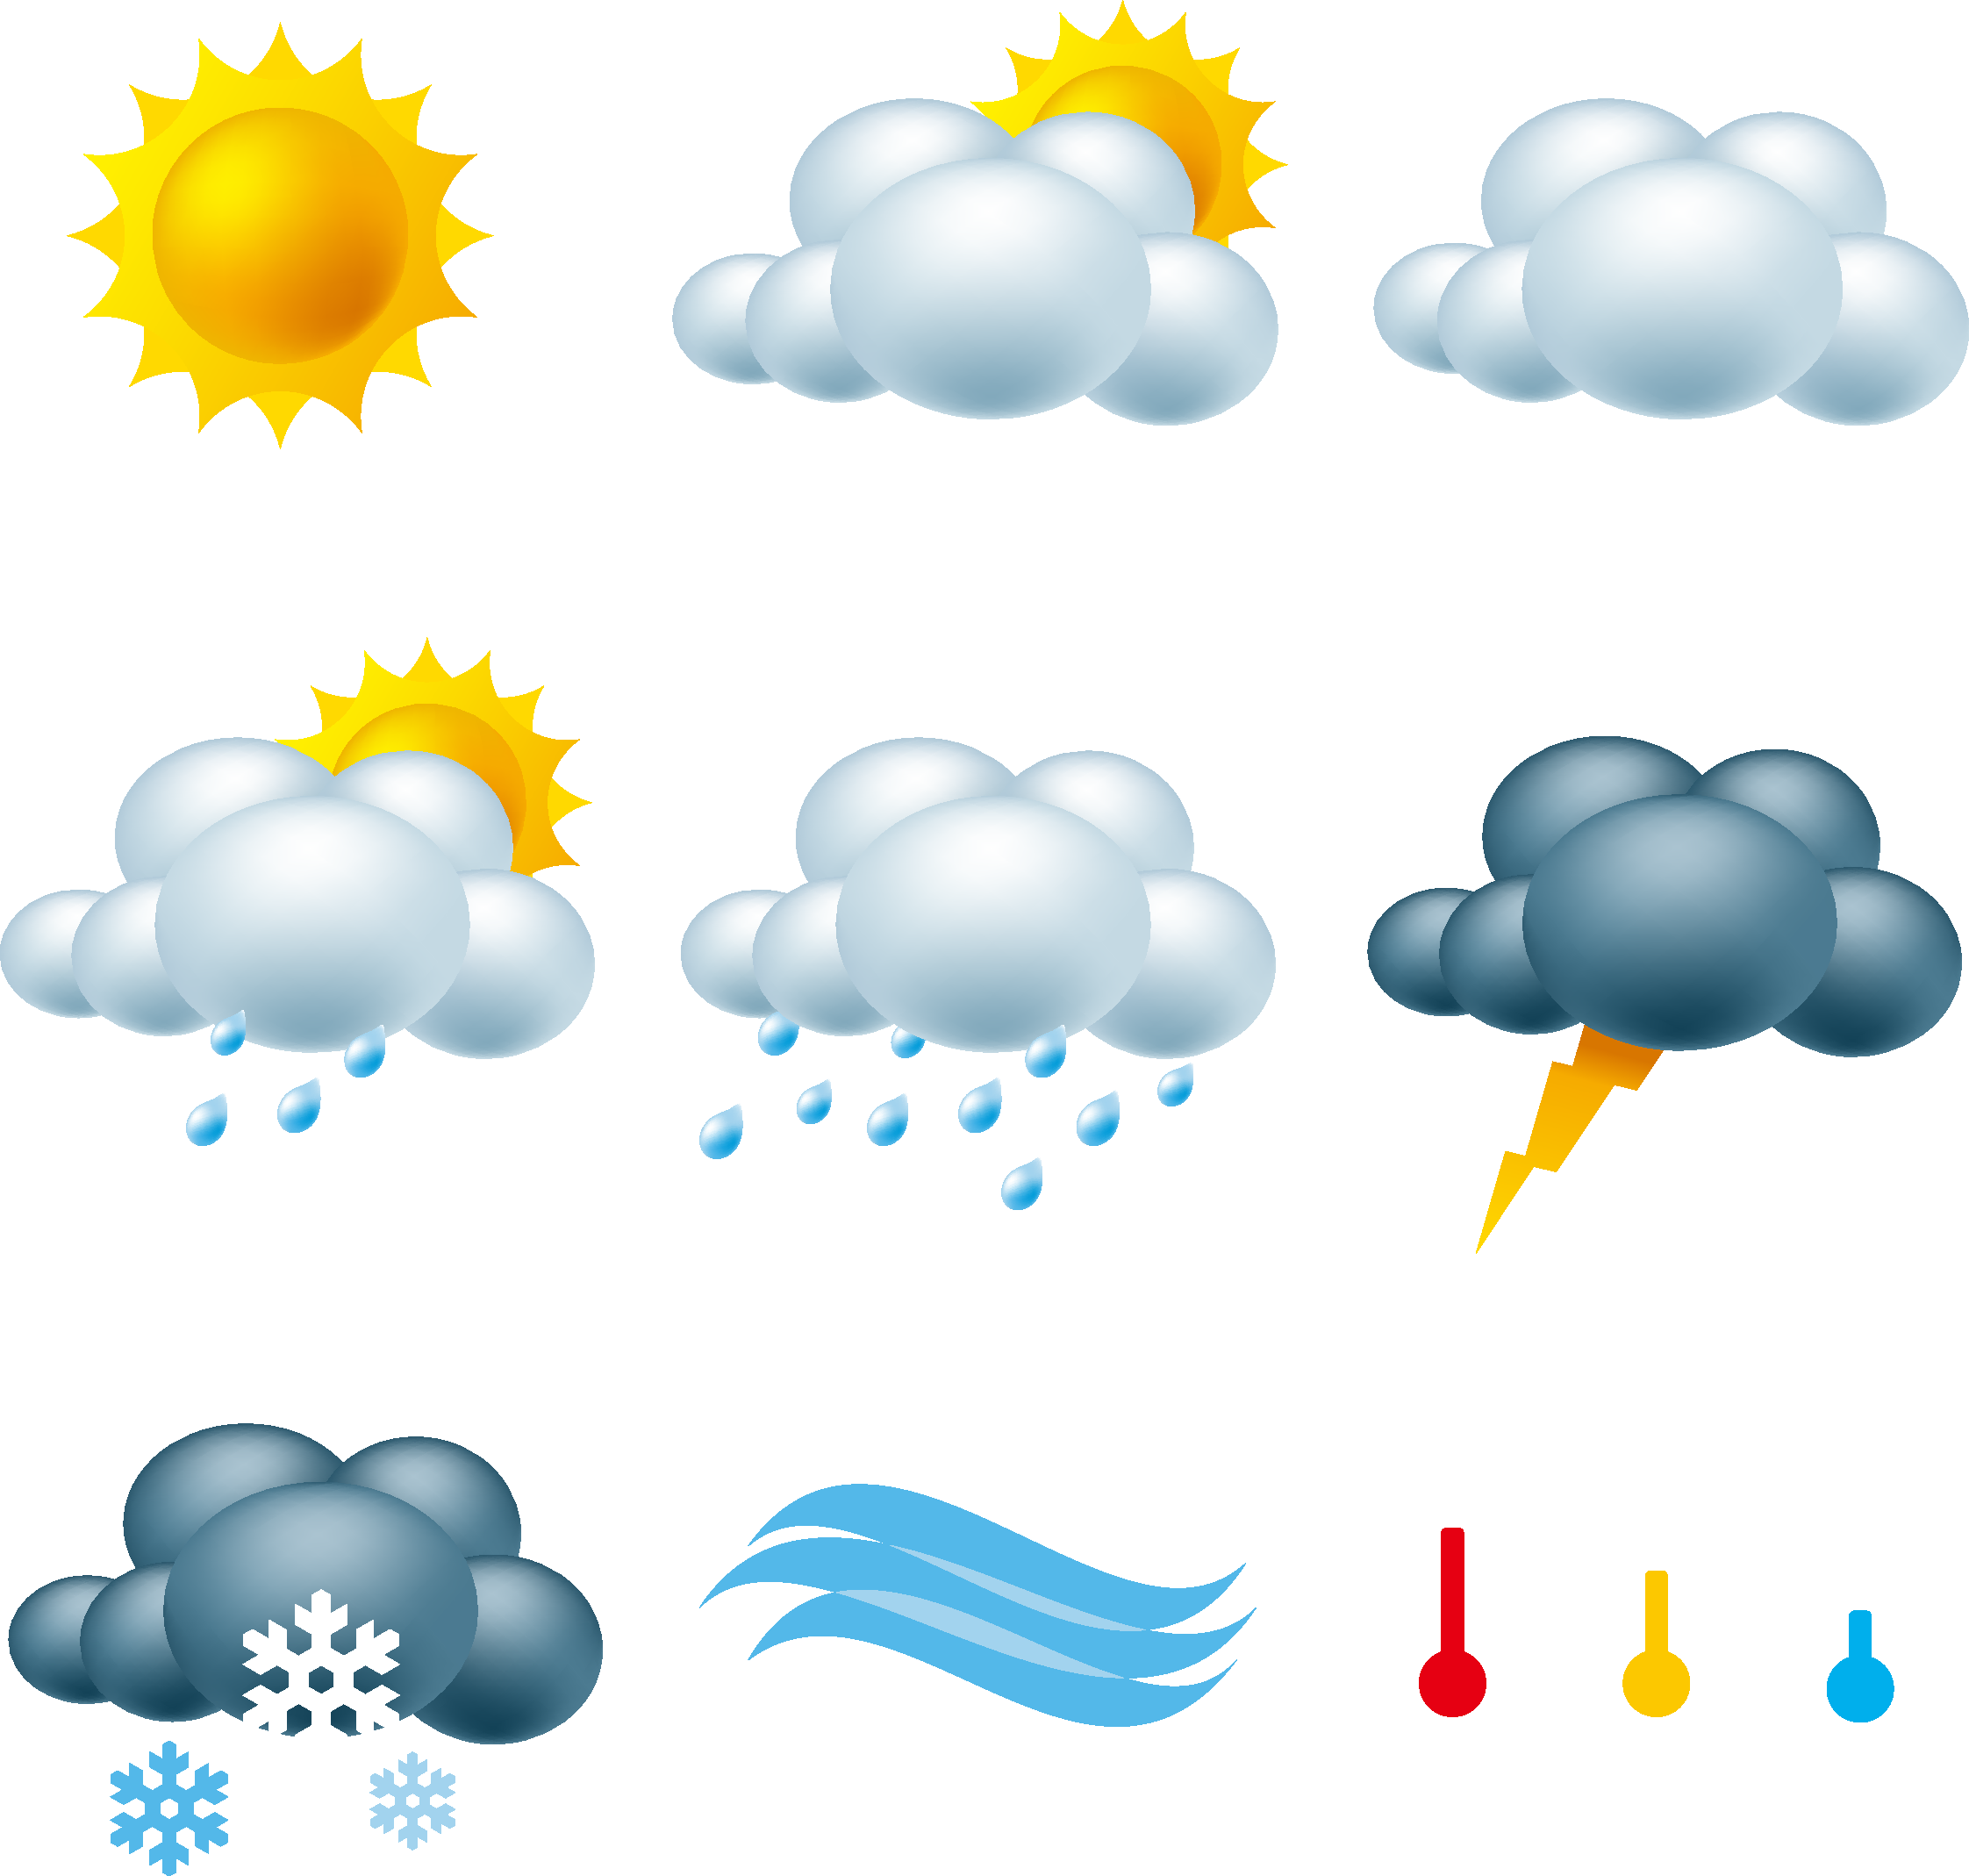 Download Forecasting Weather Forecast Icon Free Frame ICON ...  Download Foreca...